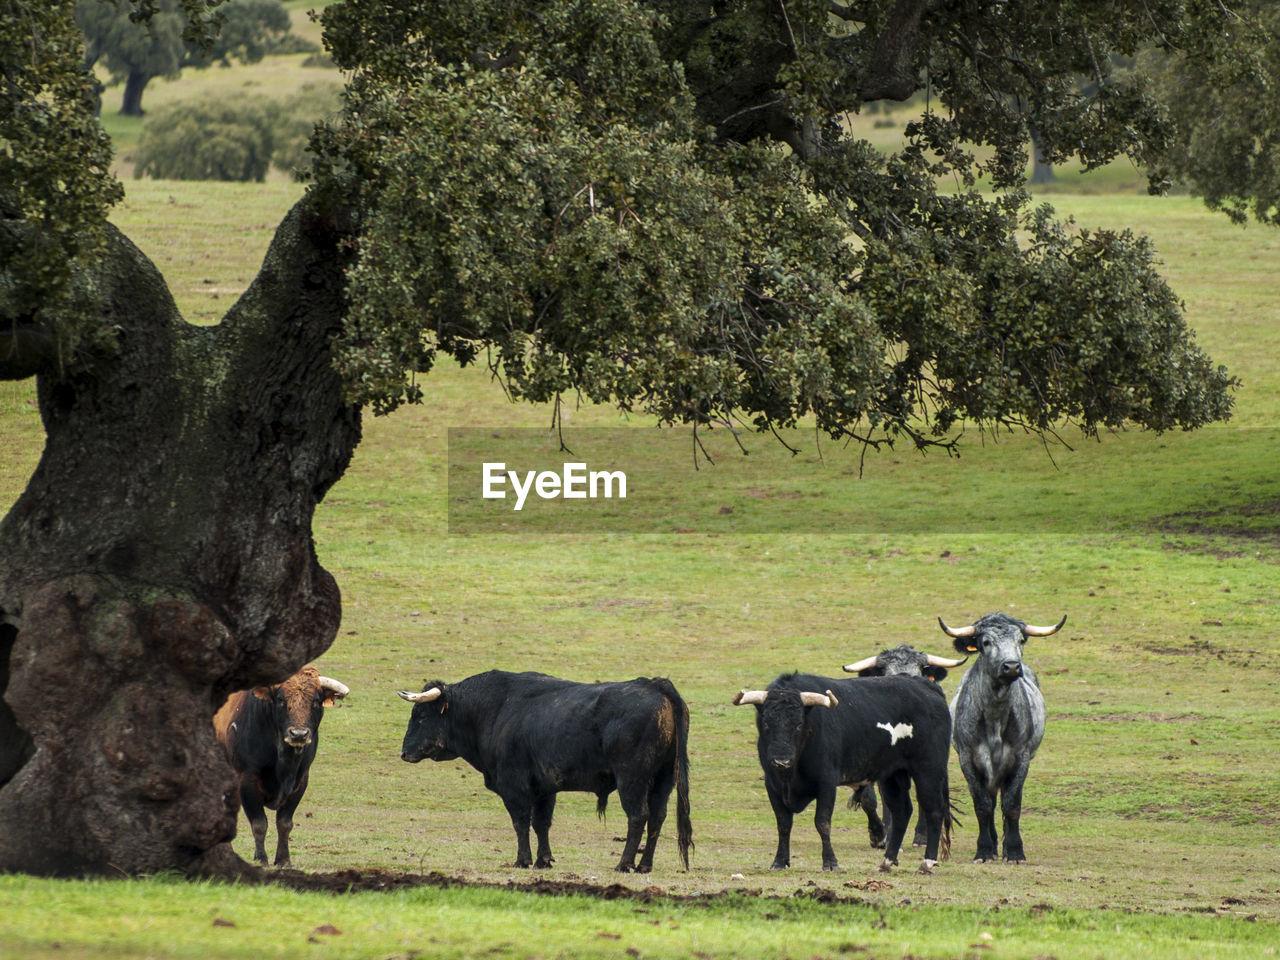 animal themes, mammal, animal, group of animals, plant, animal wildlife, tree, grass, field, domestic animals, livestock, vertebrate, land, nature, no people, landscape, day, animals in the wild, domestic, plain, herbivorous, outdoors, herd